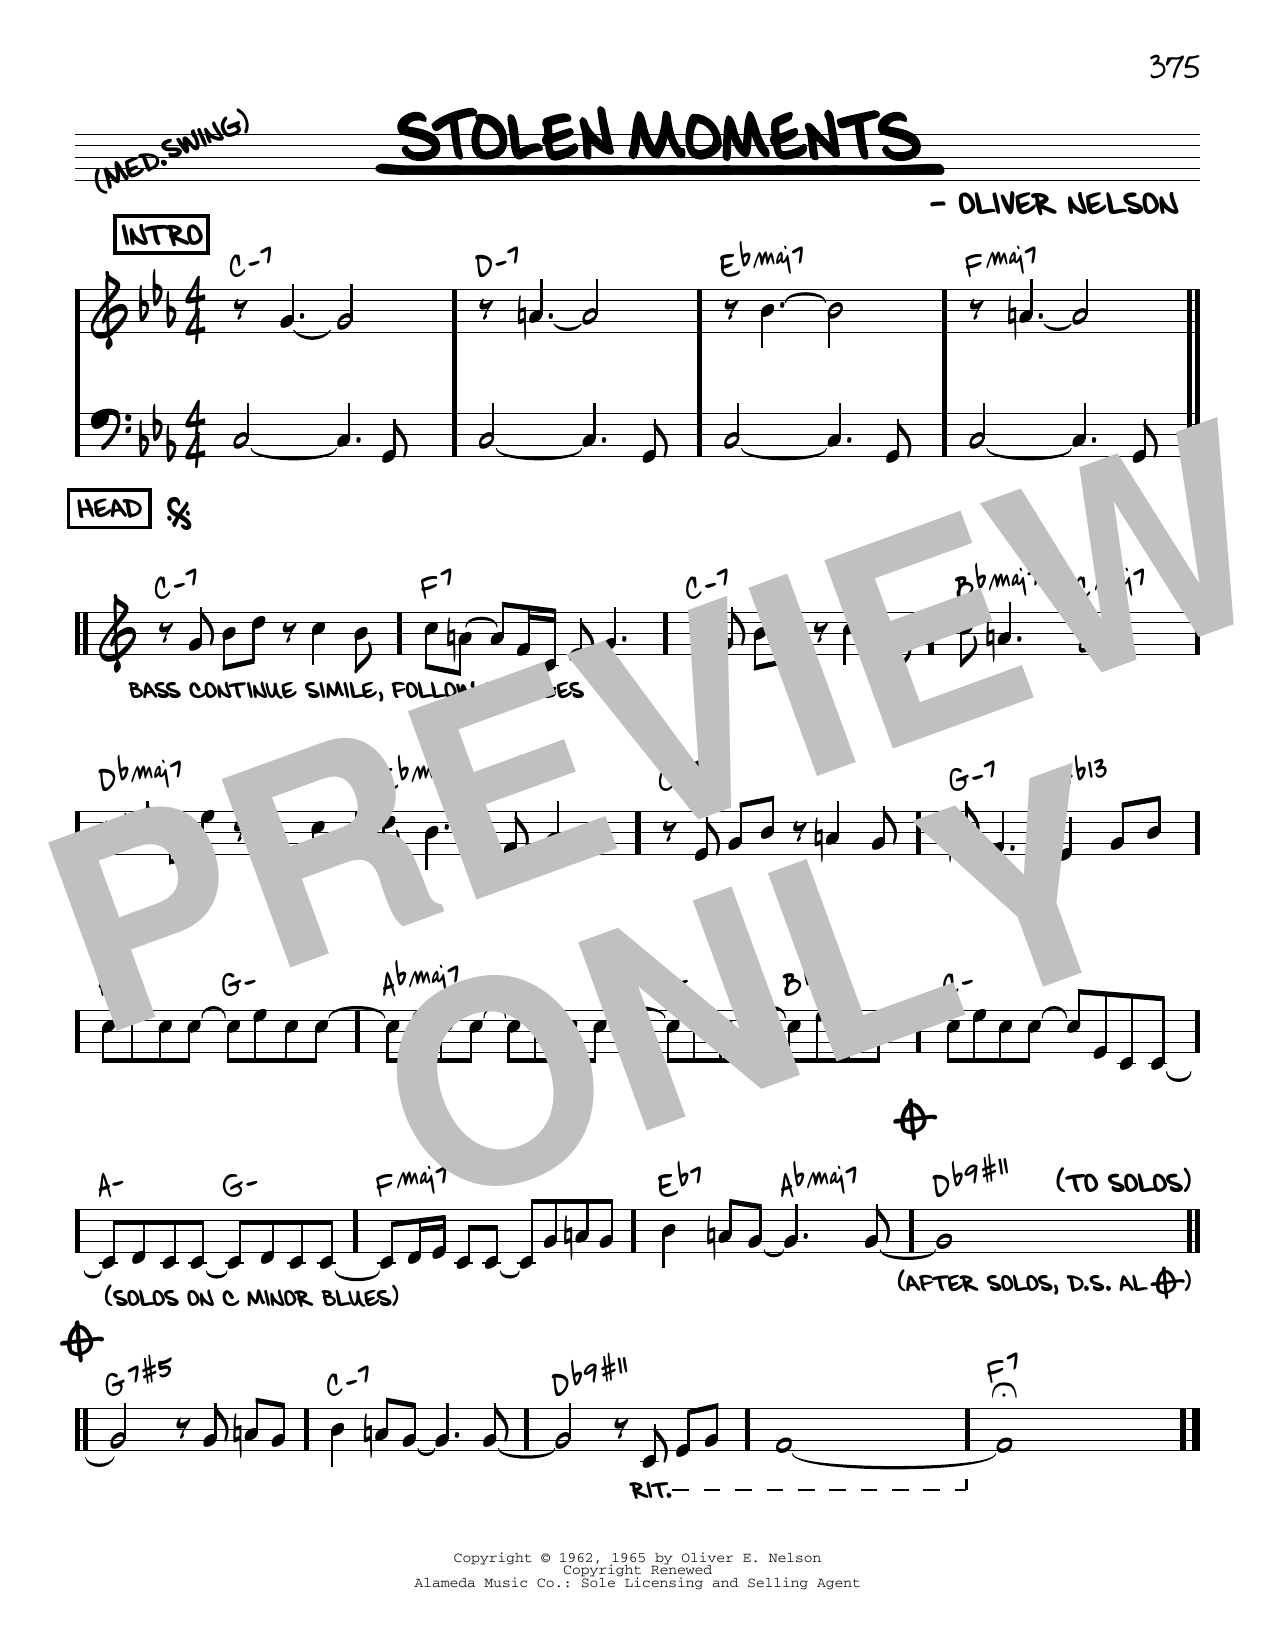 Oliver Nelson Stolen Moments [Reharmonized version] (arr. Jack Grassel) sheet music notes printable PDF score